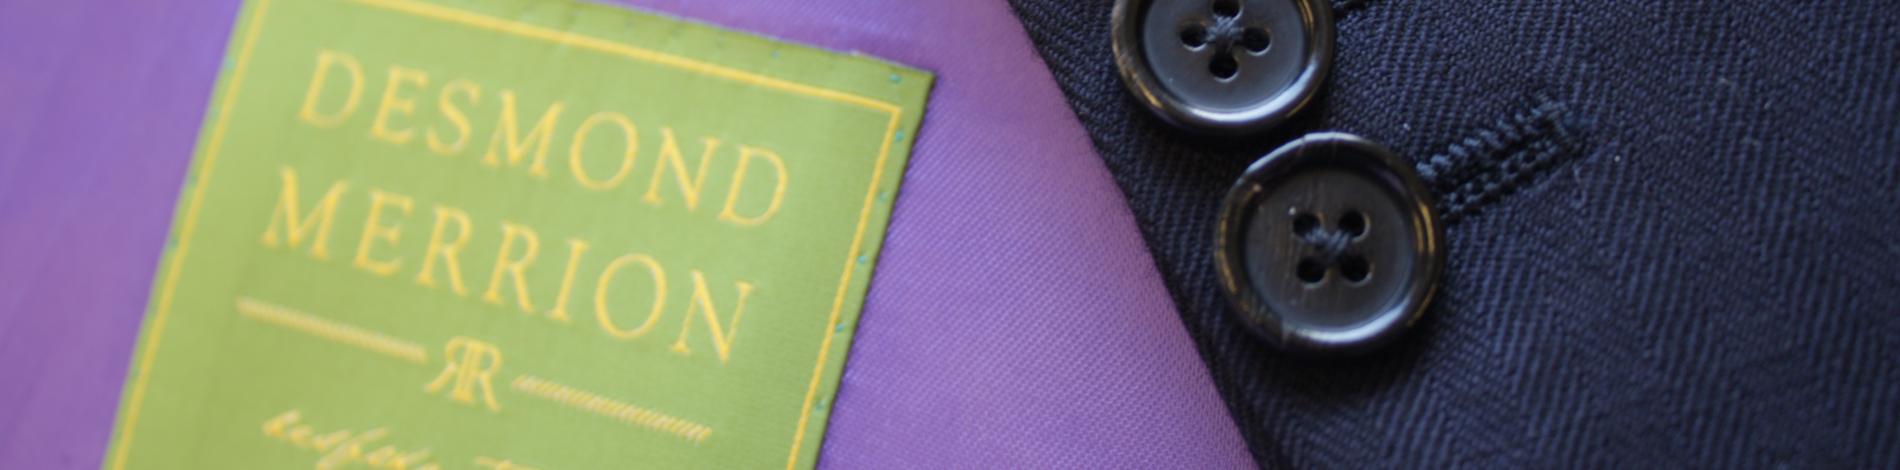 desmond merrion bespoke tailor